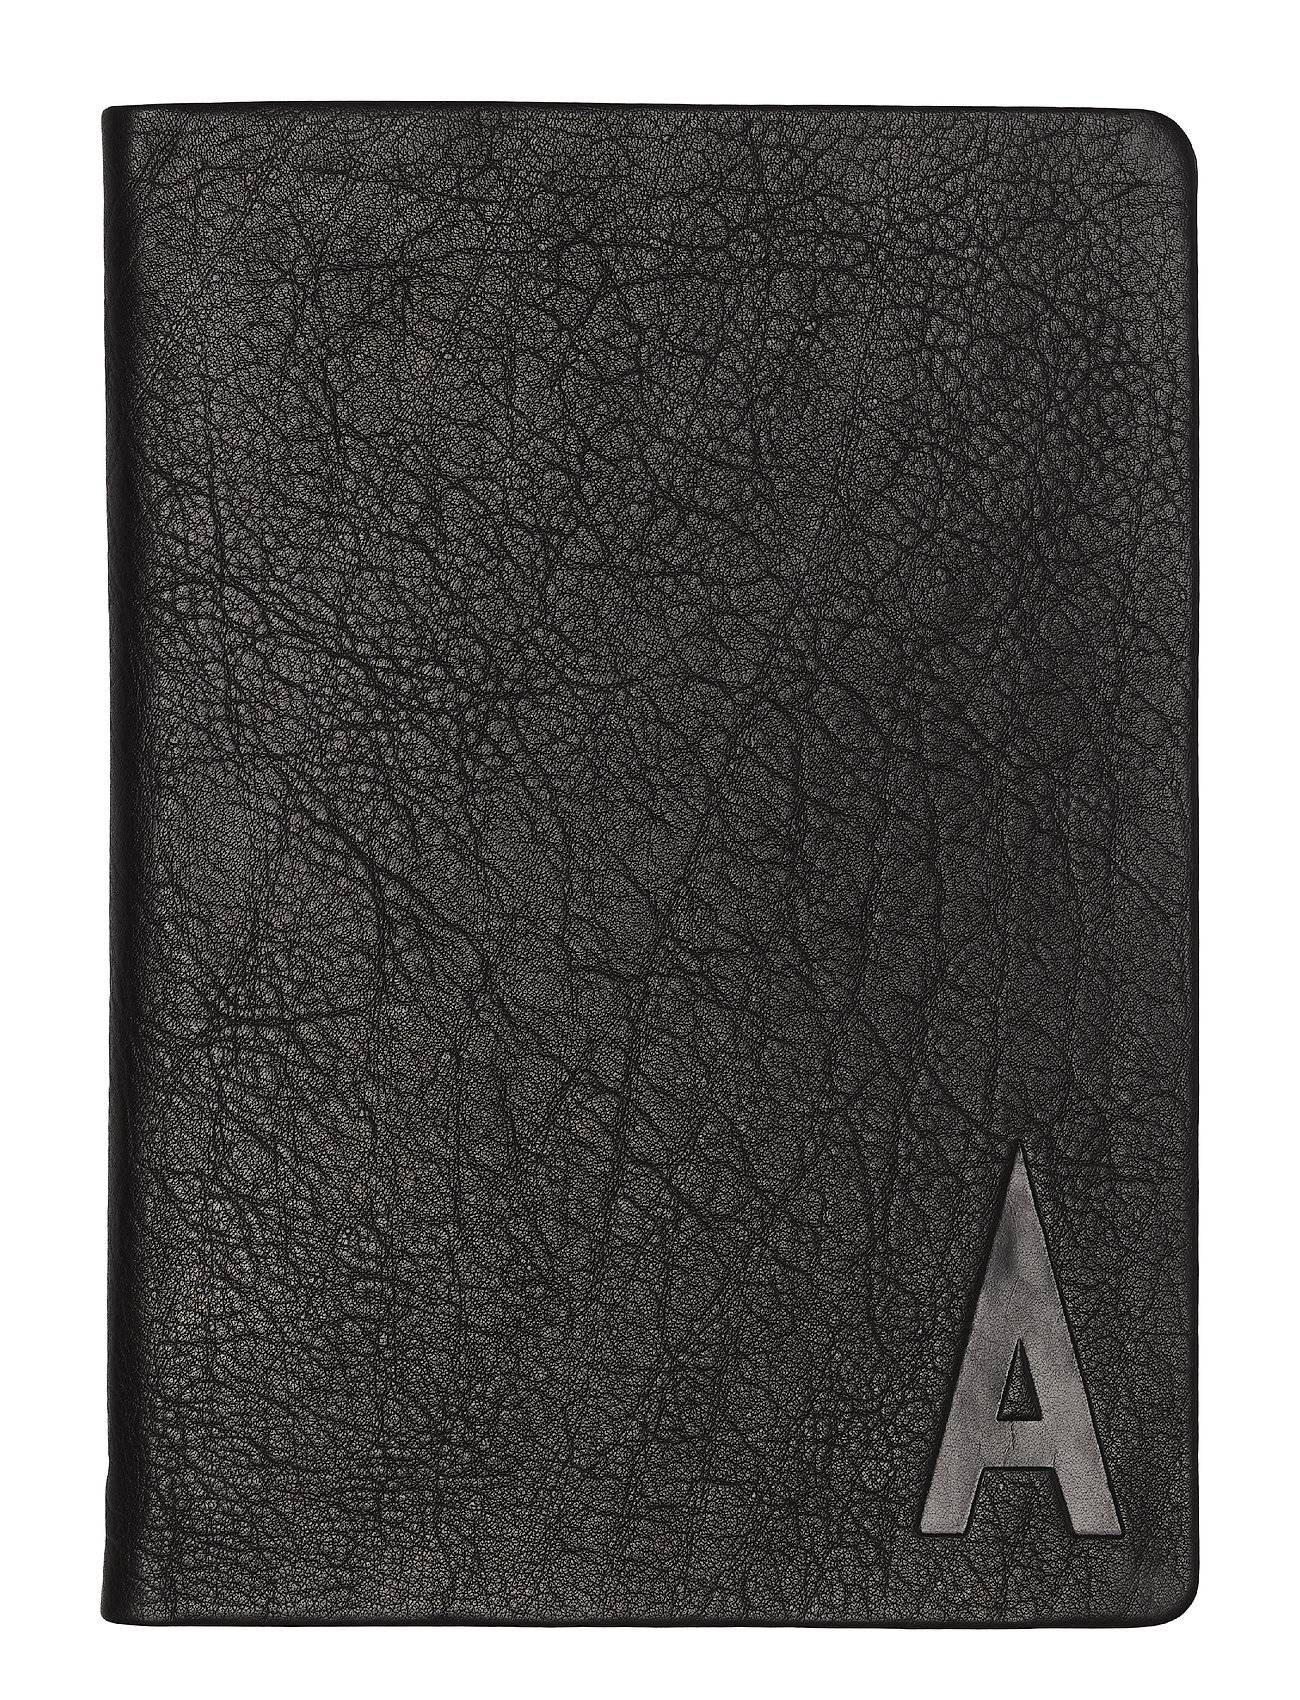 Design Letters Suit Up - Personal Notebook Kodin Sisustus Musta Design Letters